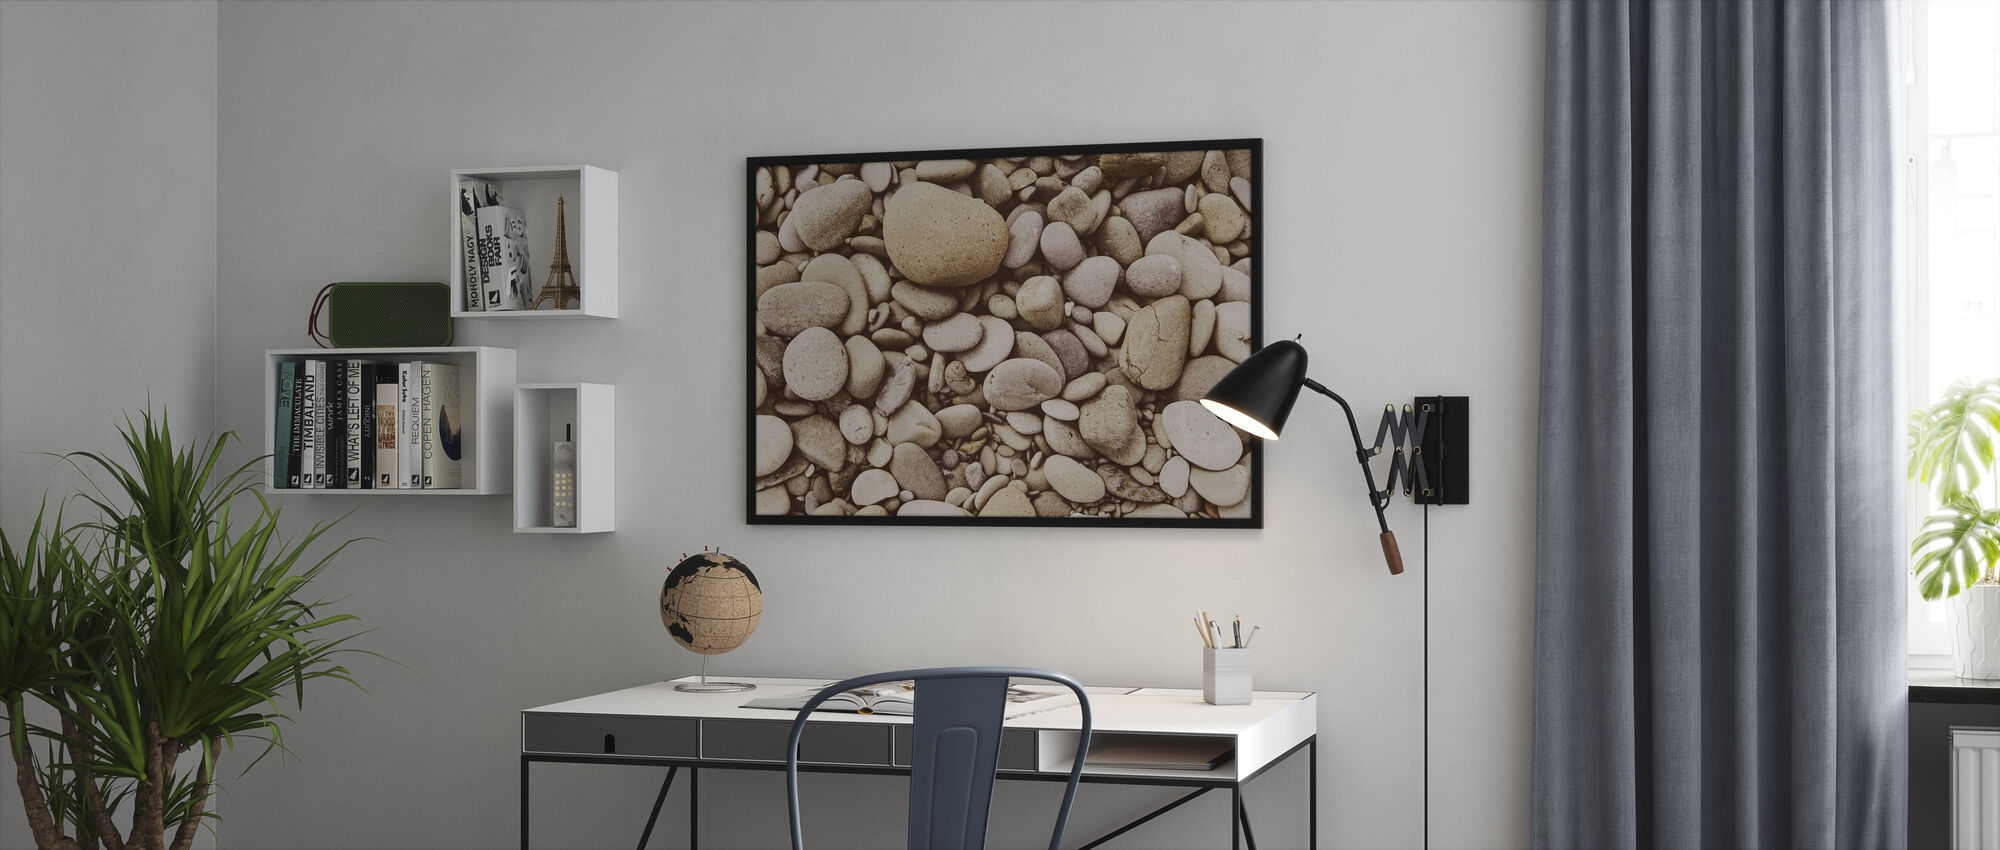 Polished Pebble - Framed print - Office